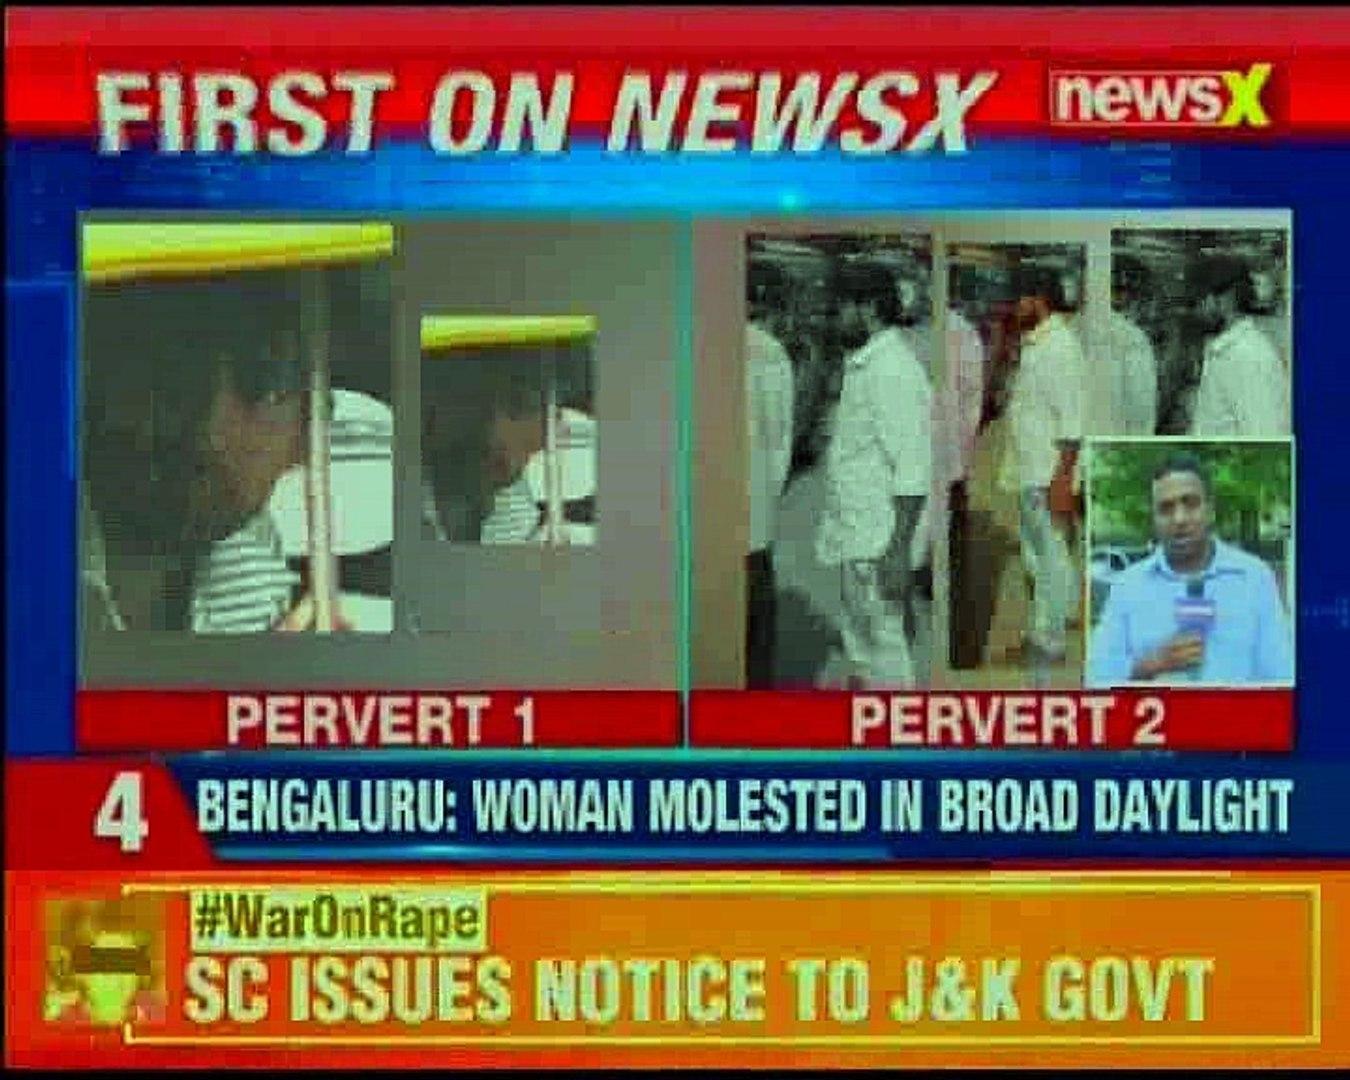 Perverts molested Bengaluru women in daylight, onlookers became mute spectators